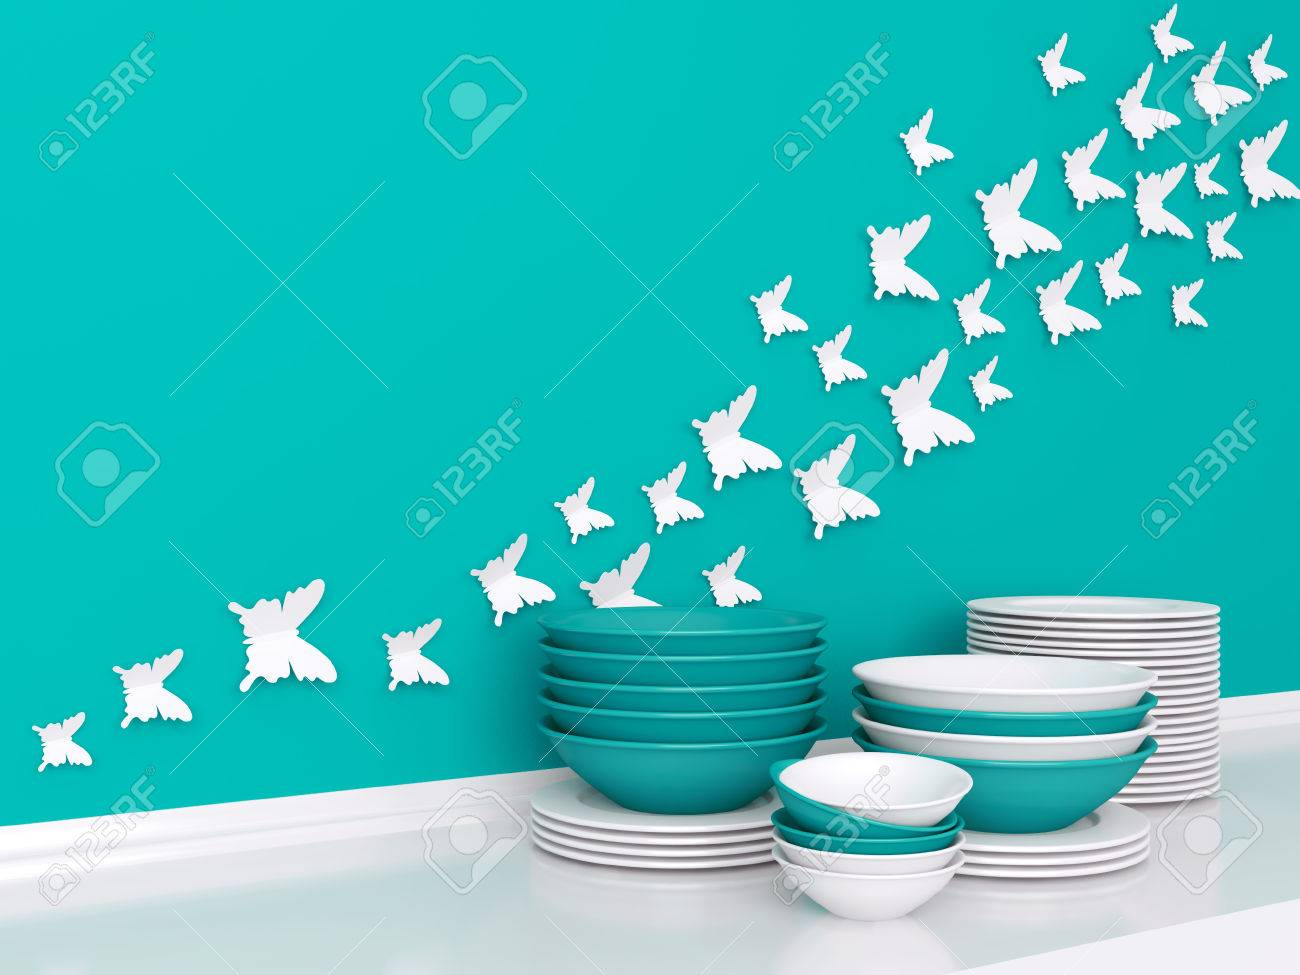 Modern White And Blue Kitchen Design. Ceramic Kitchenware On.. Stock ...